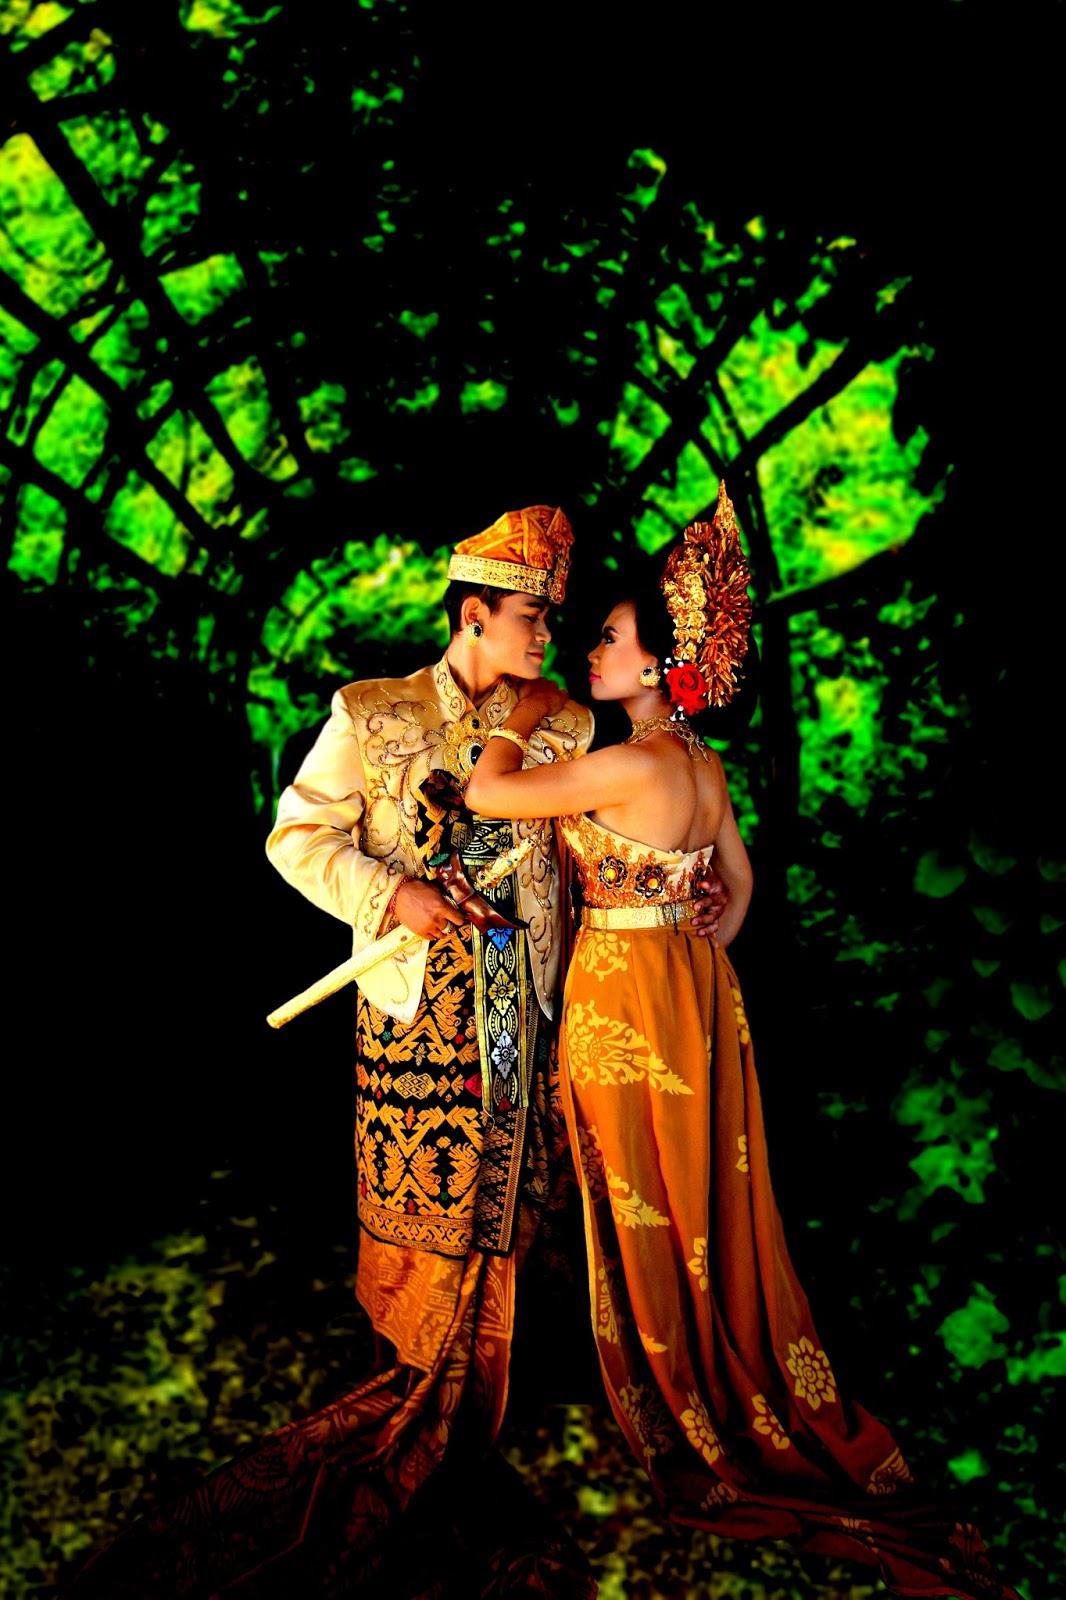 Rumah Adat Dan Pakaian Adat Bali nama pakaian adat bali disebut denah